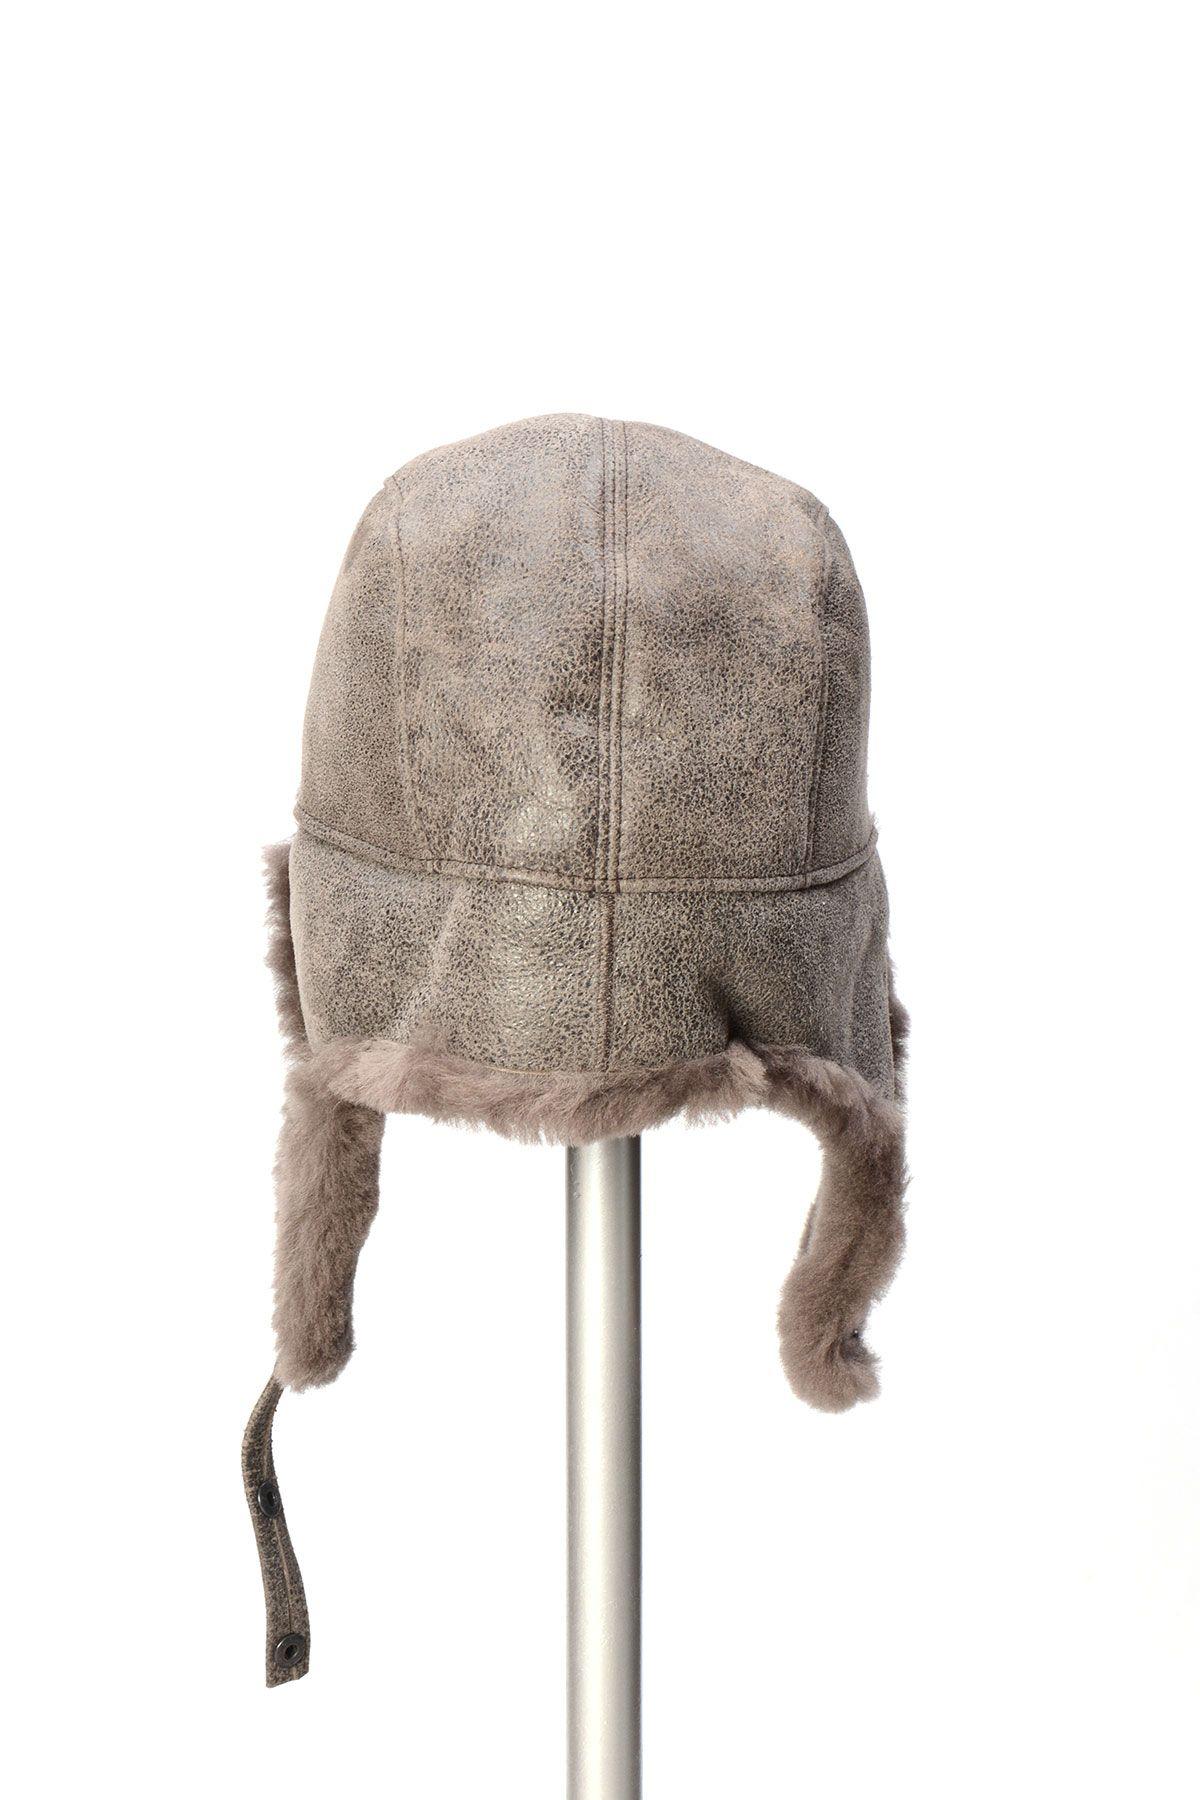 Pegia Hakiki Kürklü Şapka 19SB04 Gri